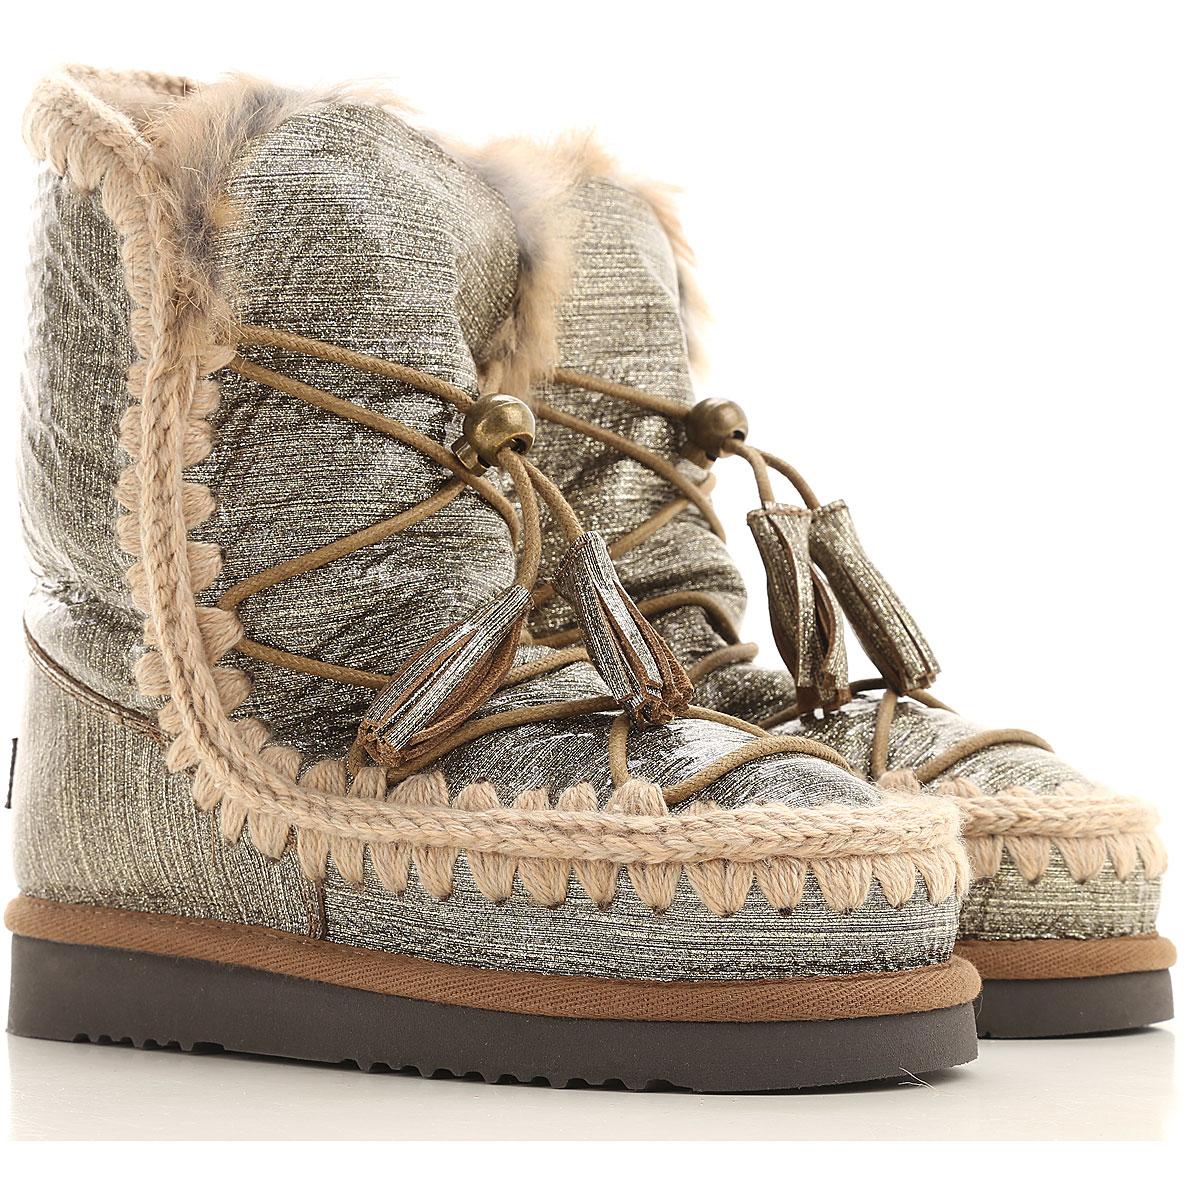 Mou Boots for Women, Booties On Sale in Outlet, Dark Gold, sheepskin, 2019, EUR 38 - UK 5 - USA 7 EUR 37 - UK 4 - USA 6.5 EUR 39 - UK 6 - USA 8.5 EUR